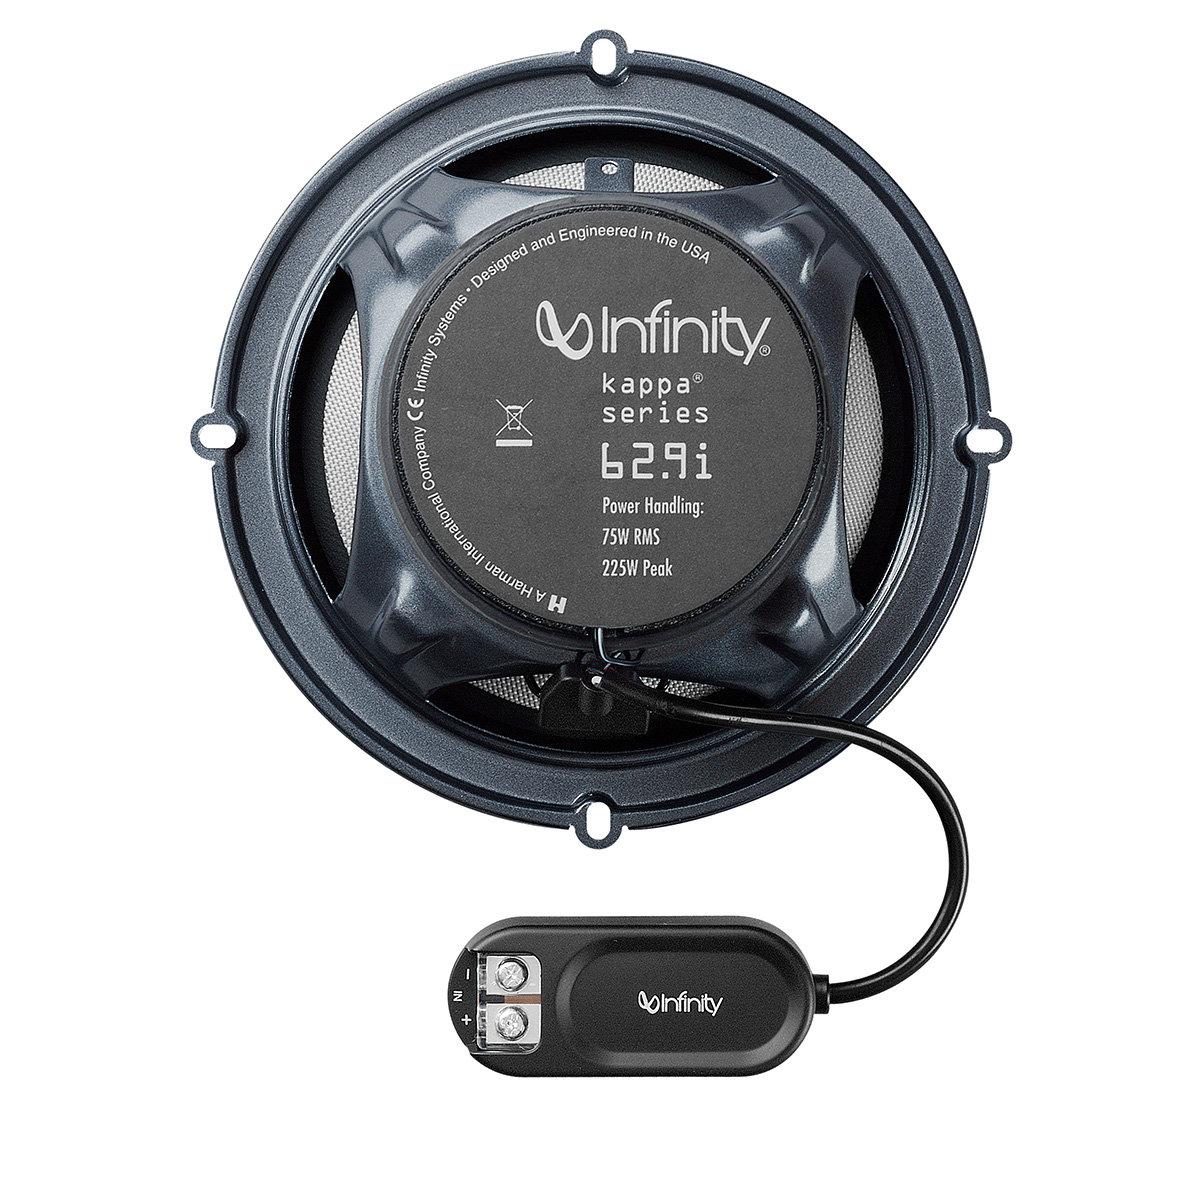 pontiac vibe stereo wiring diagram images stereo wiring vibe subwoofer wiring diagram subwoofer wiring wizard speaker